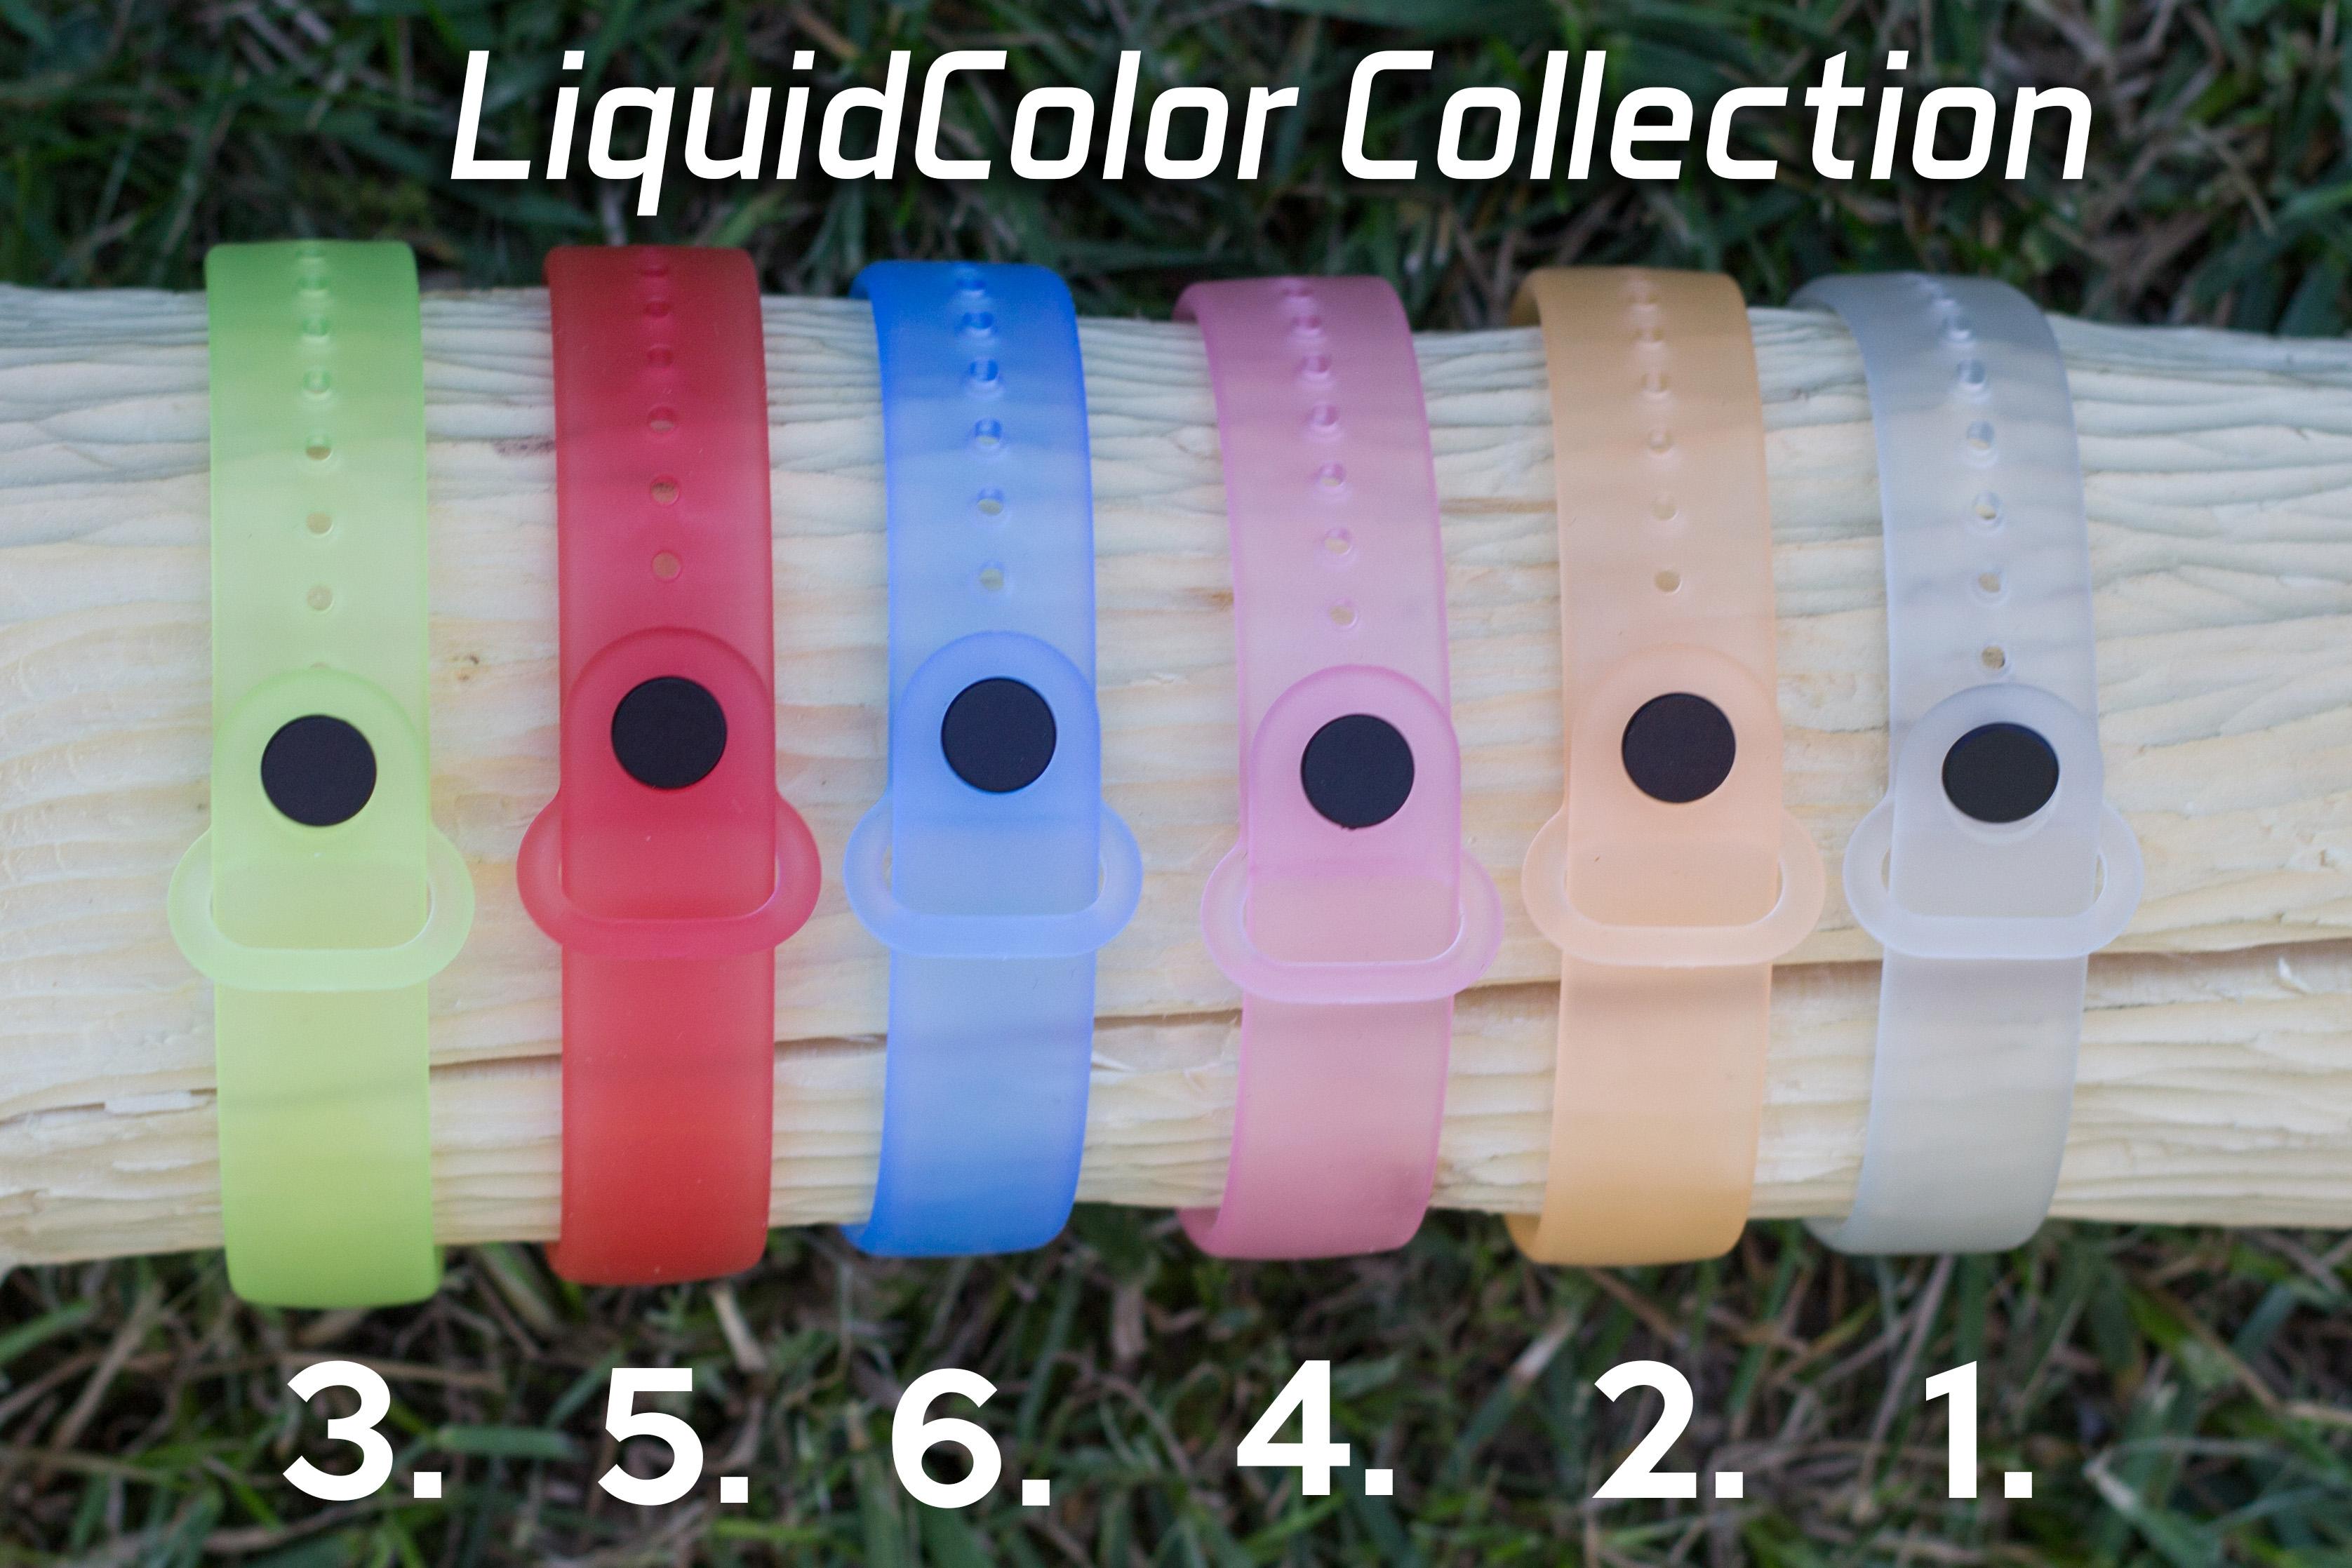 Mi Band 3 szilikon pánt - LiquidColor 3